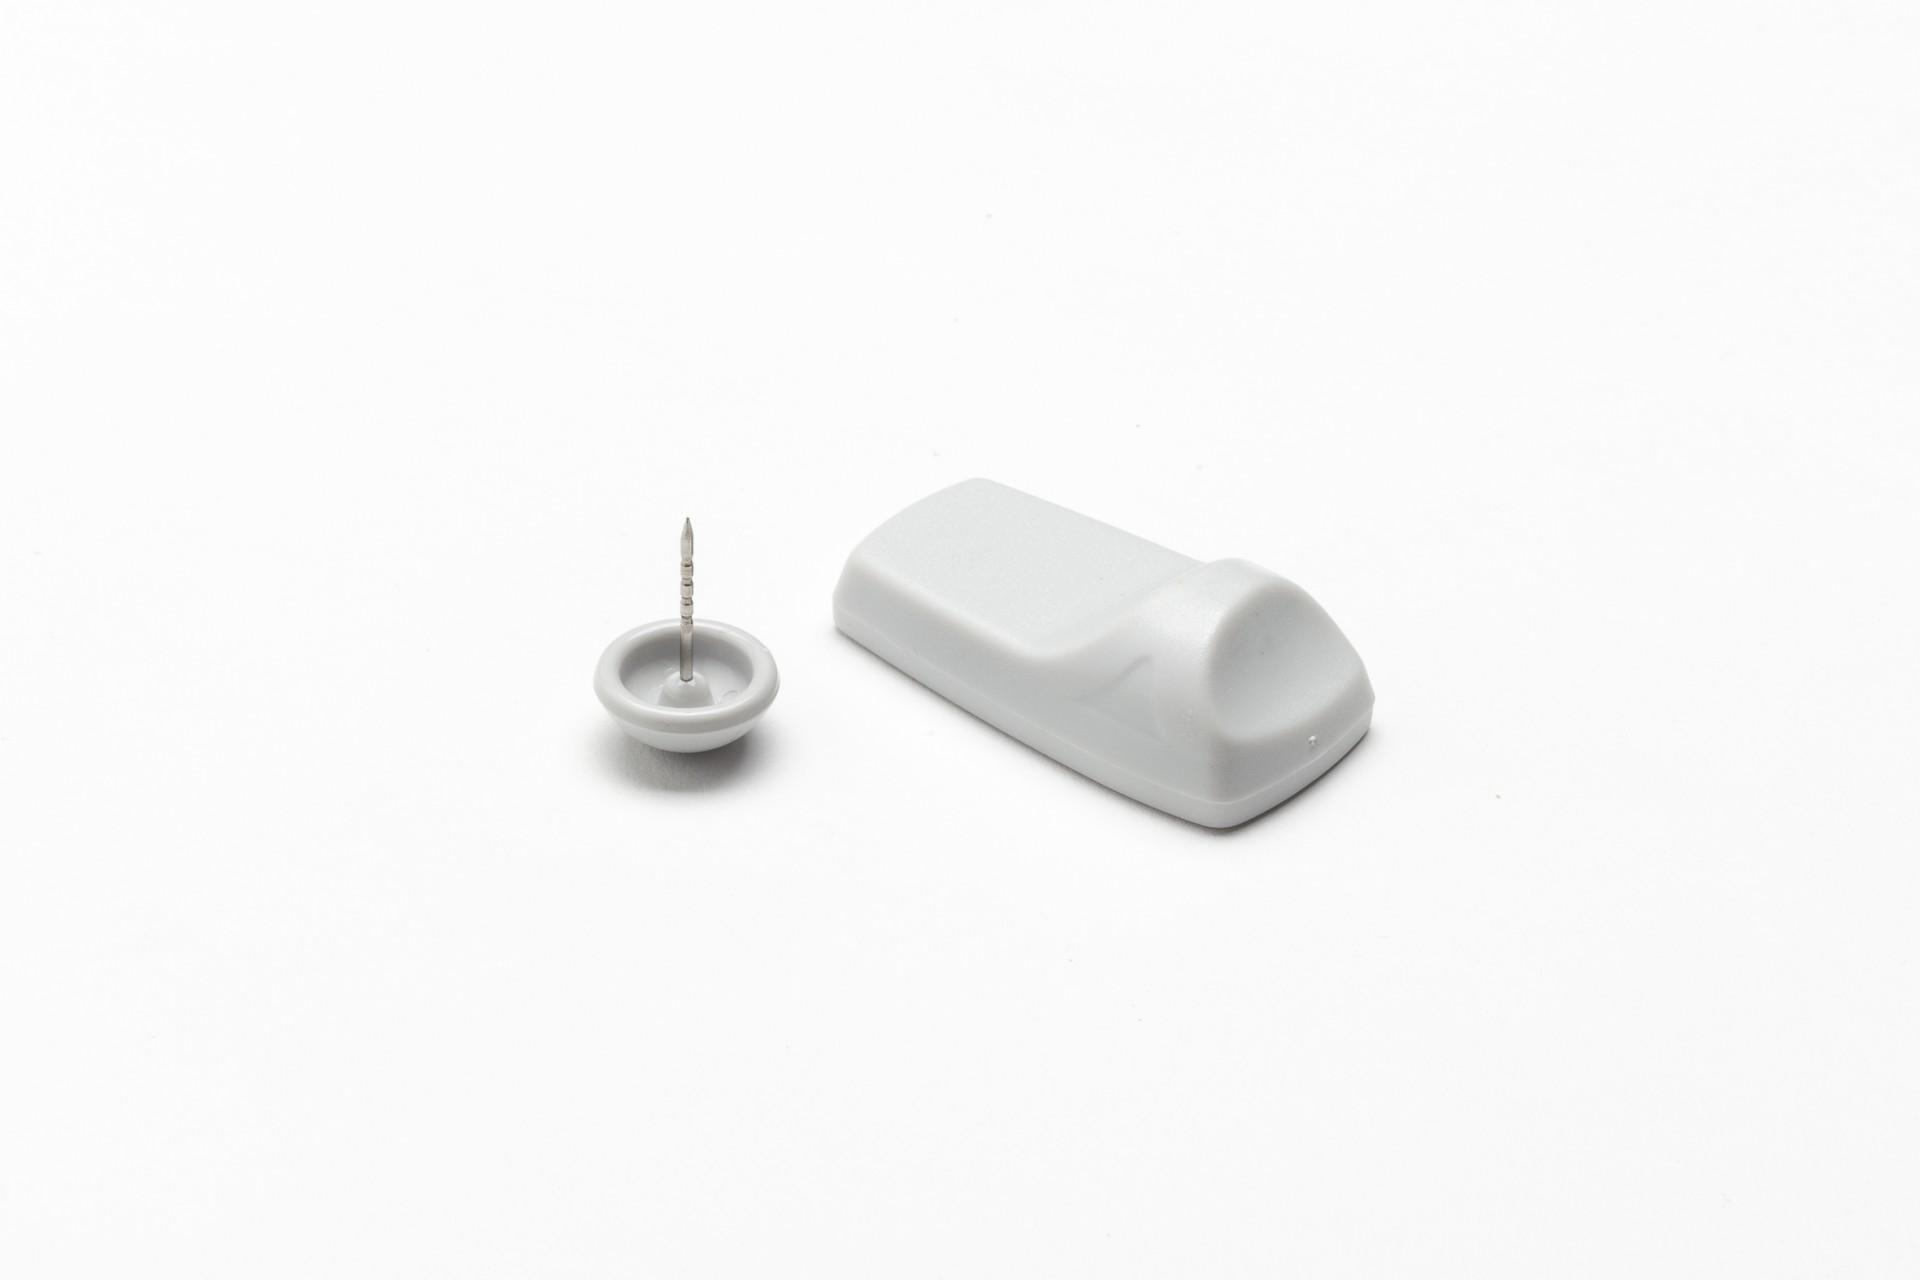 Alarme rígido acústico magnético fecho magnético